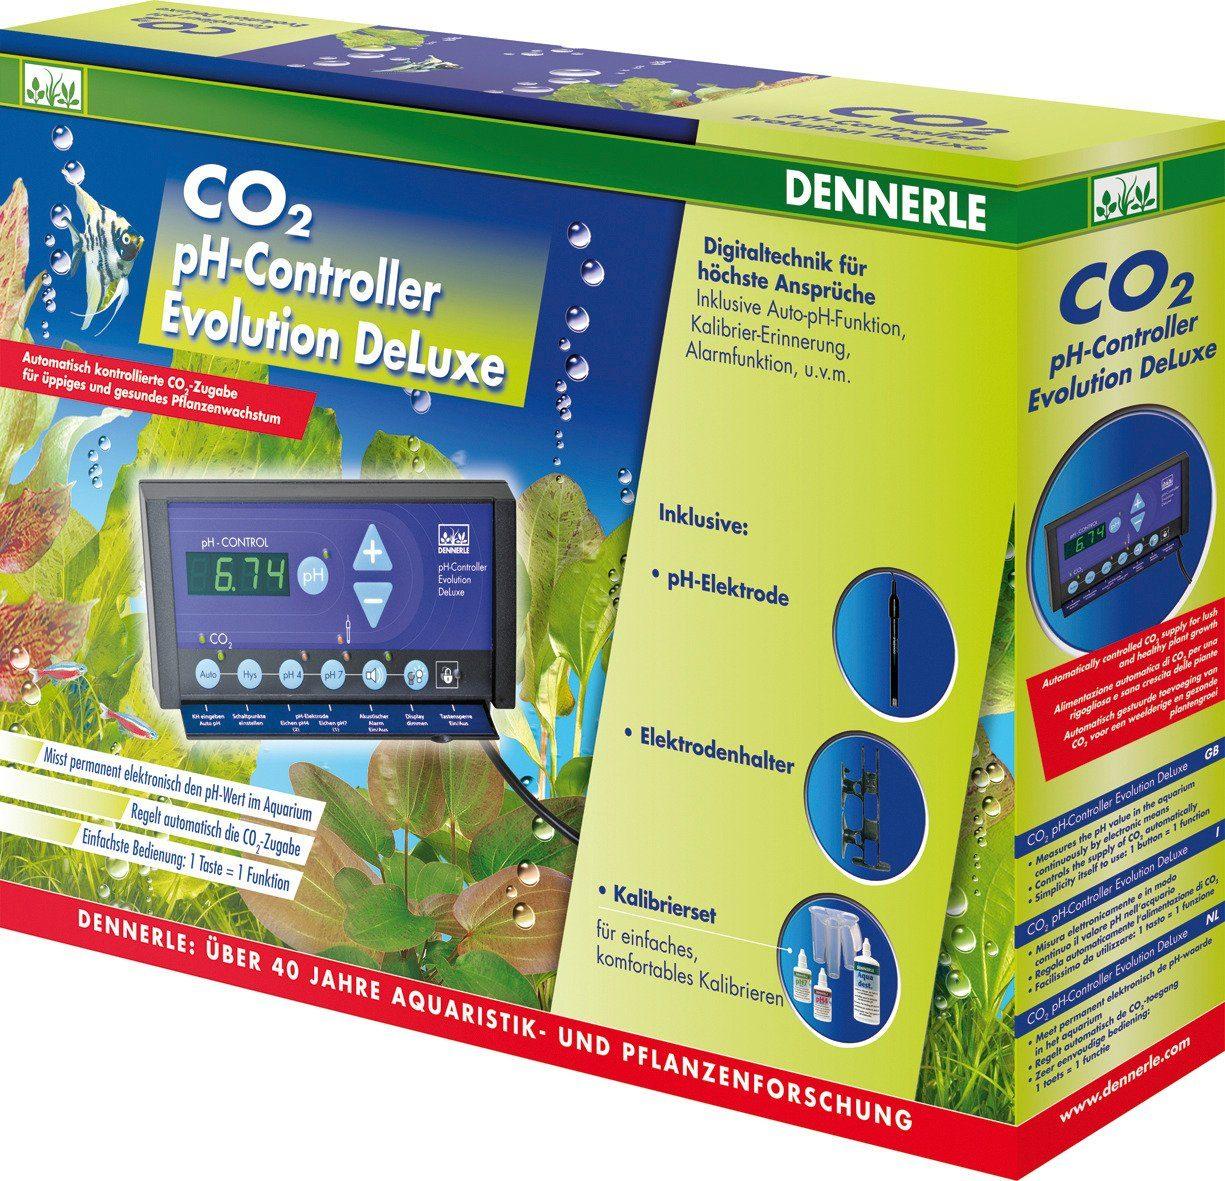 Dennerle Aquariumpflege »CO 2 pH-Controller Evolution Deluxe«